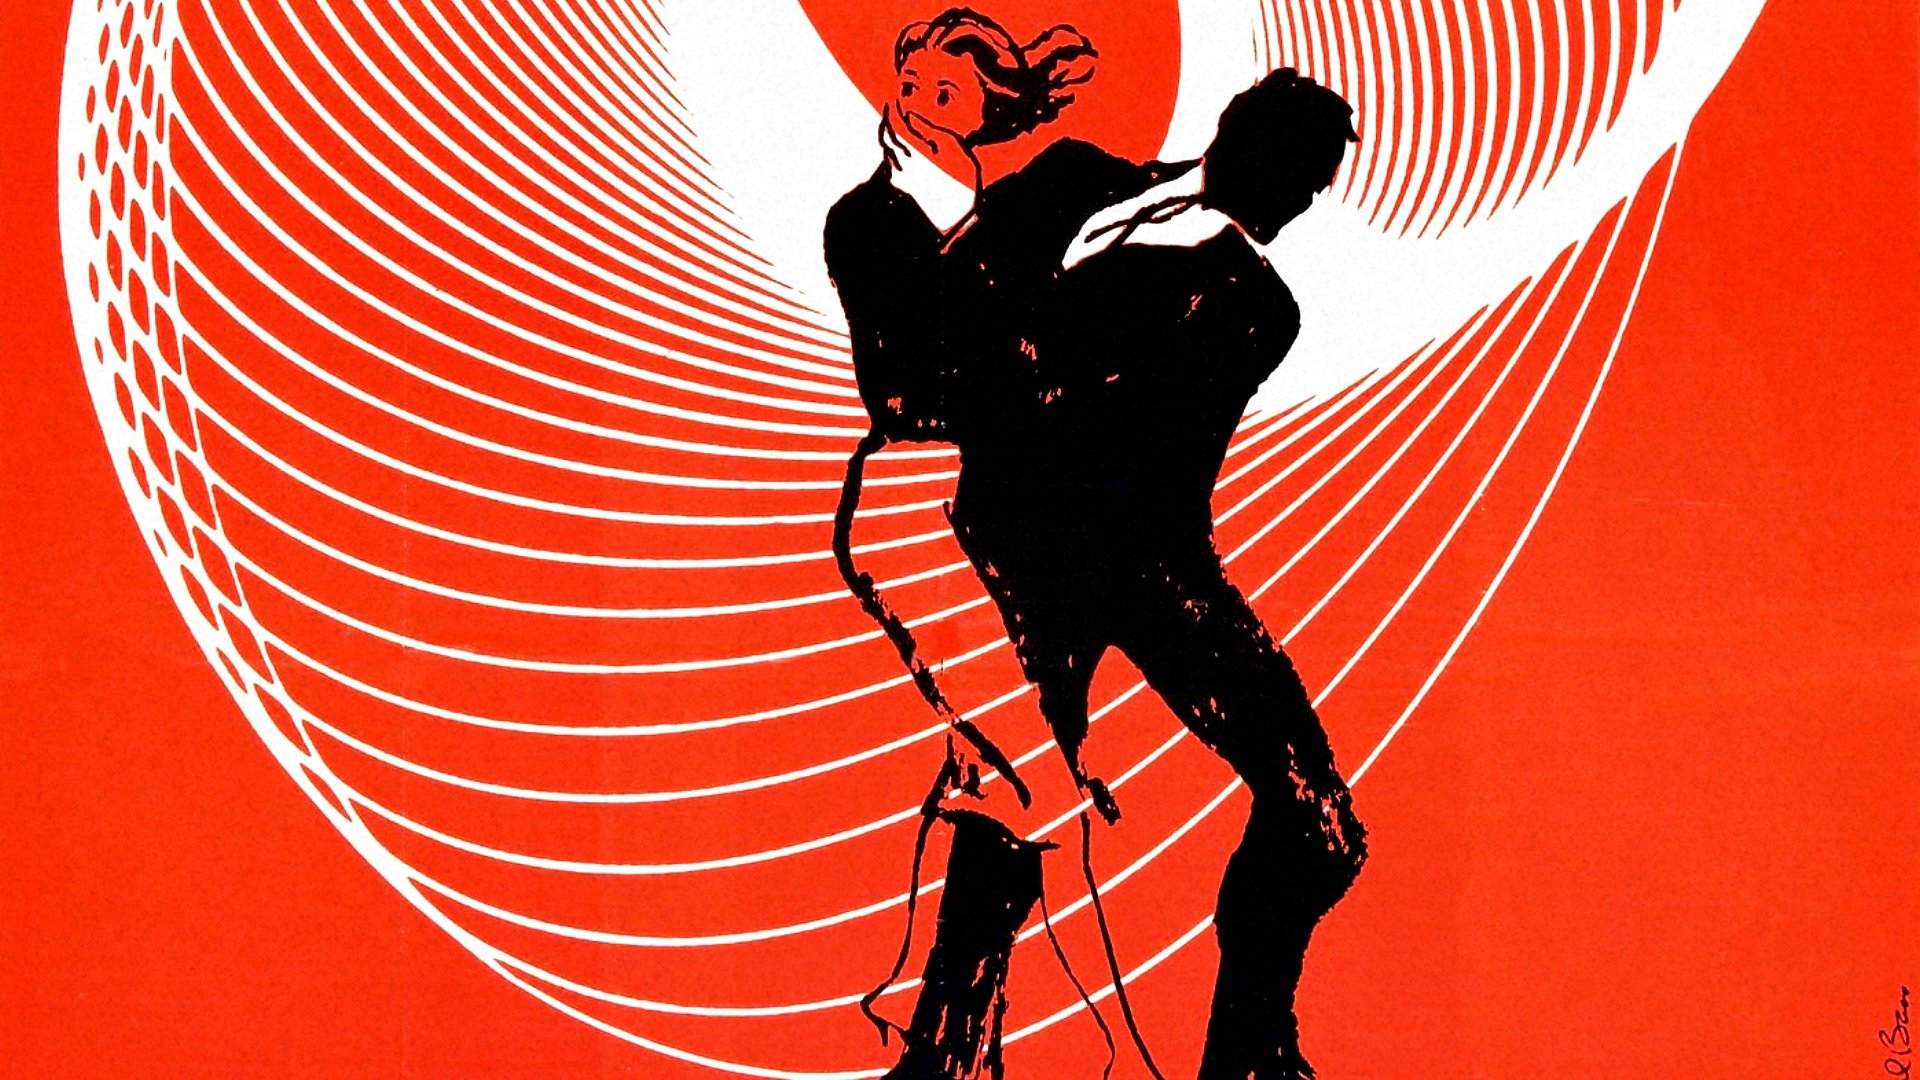 Must see Wallpaper Movie Vertigo - thumb-1920-611045  HD_751023.jpg